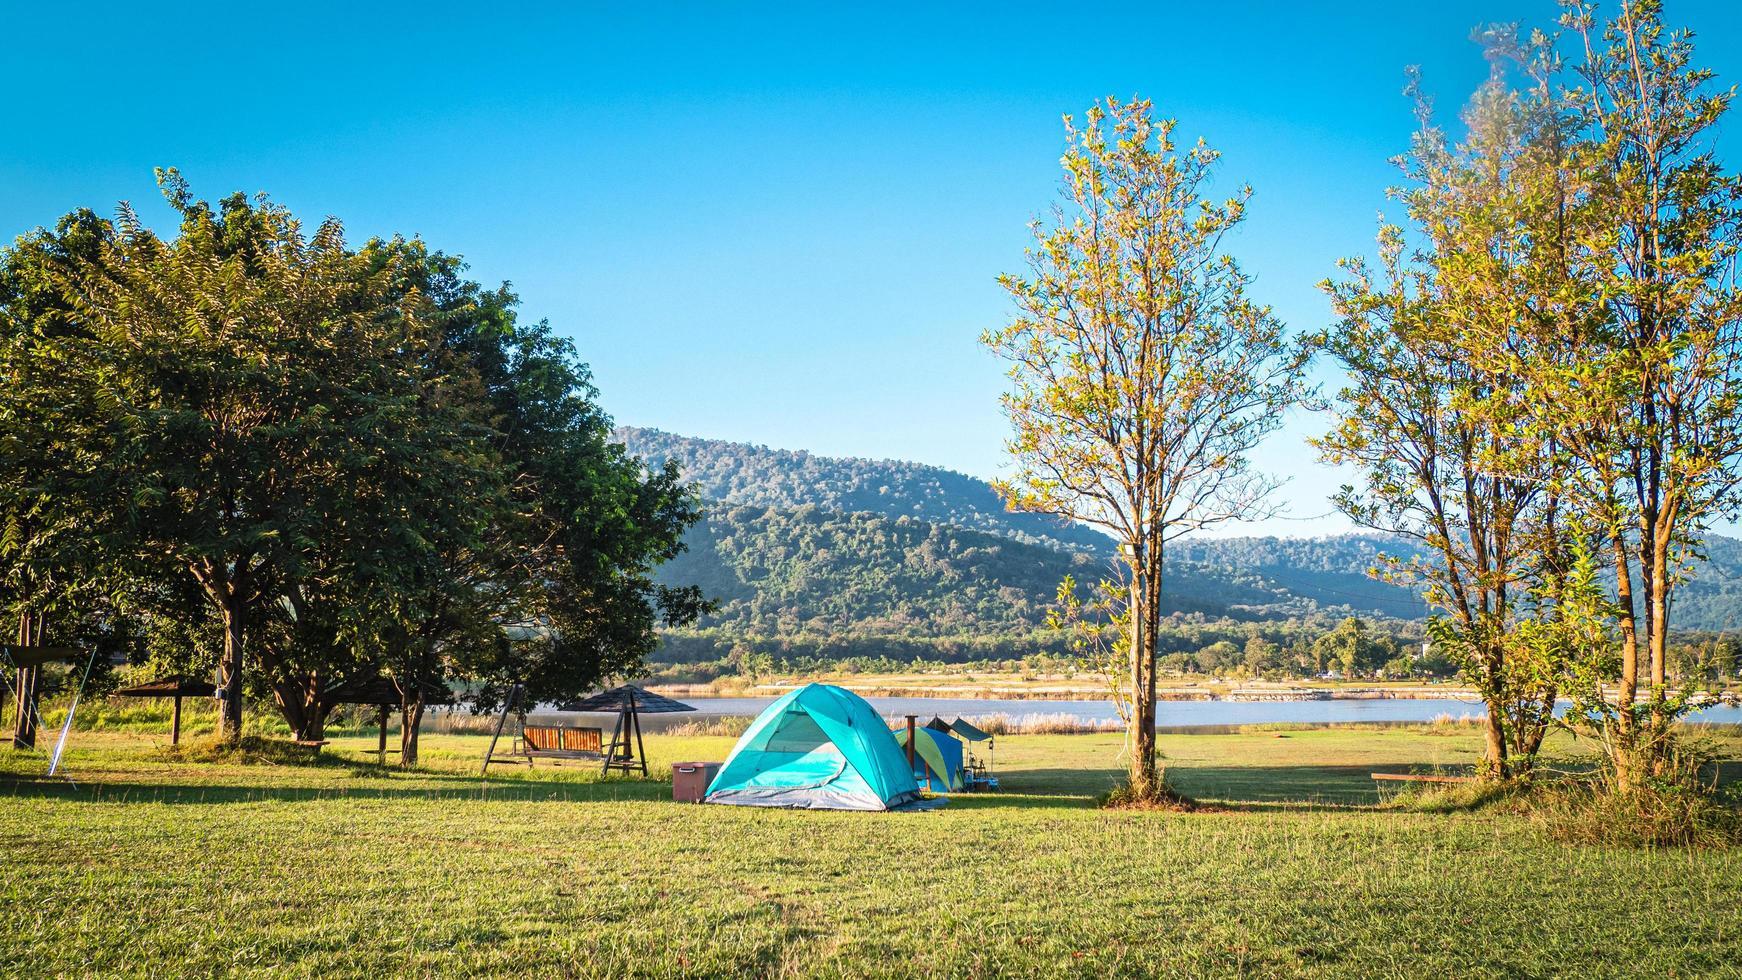 toeristische tent camping foto